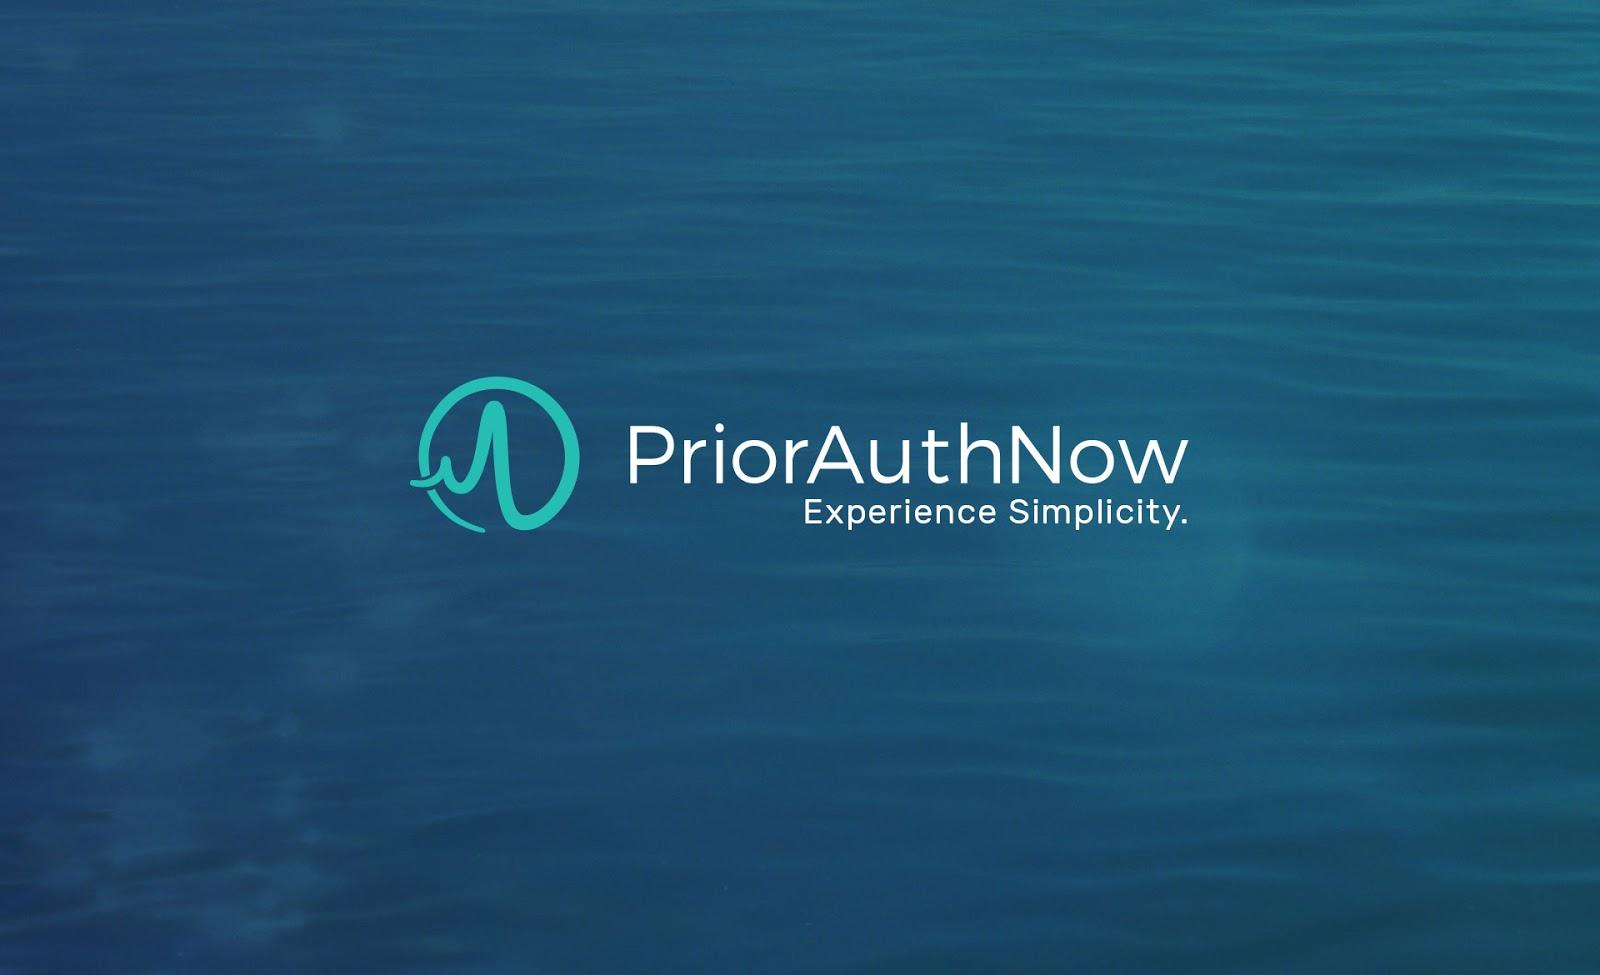 PriorAuthNow Logo